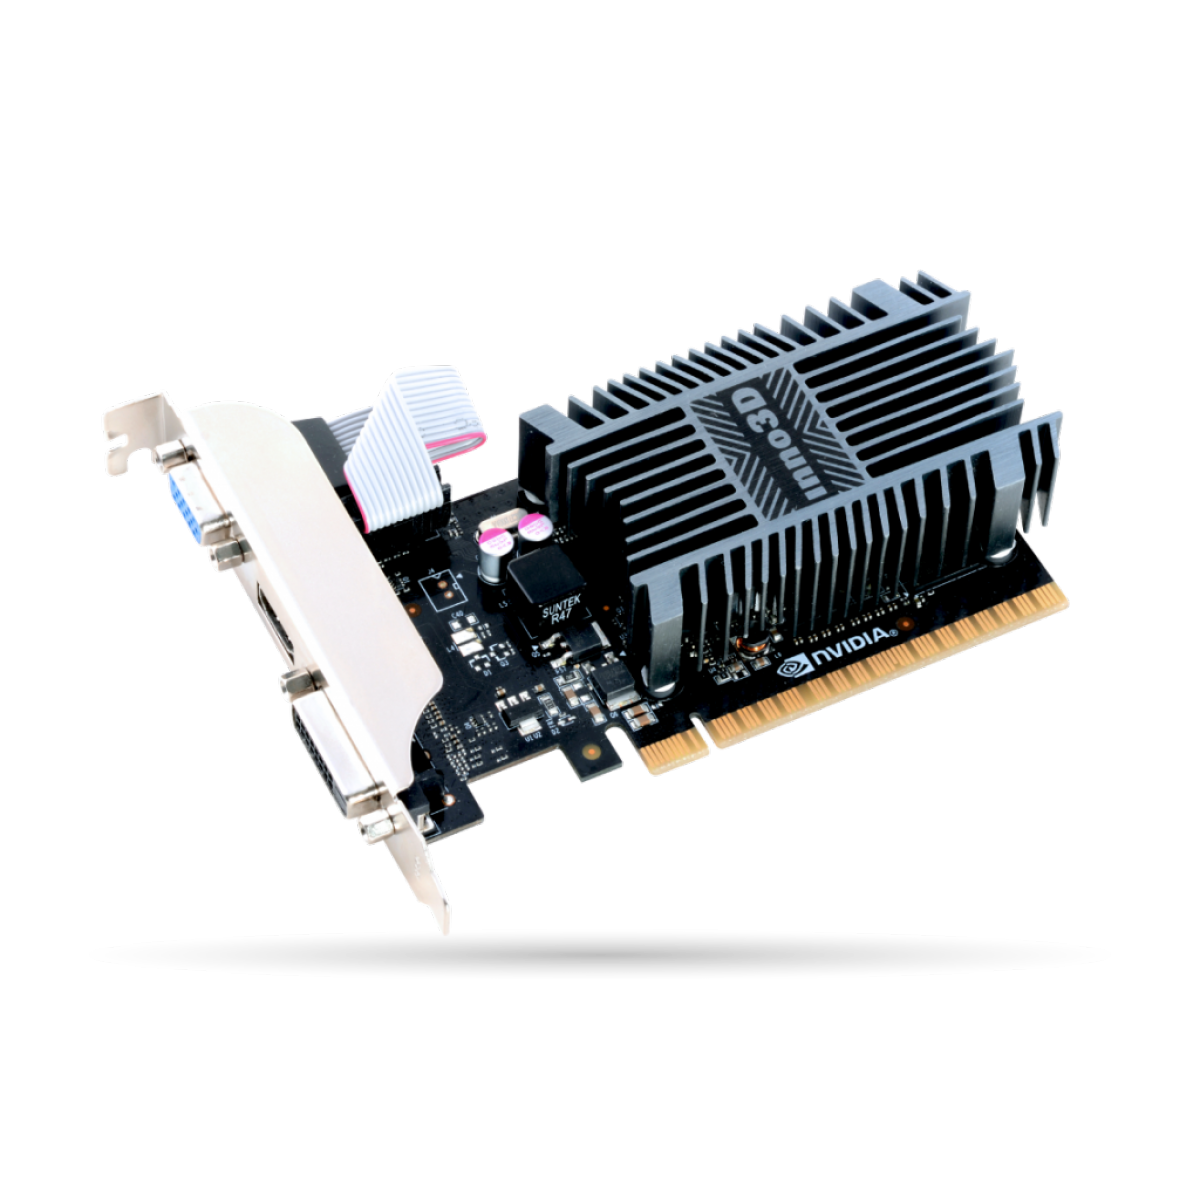 Placa de Vídeo Inno3D GT 710, 2GB, DDR3, 64bit, N710-1SDV-E3BX